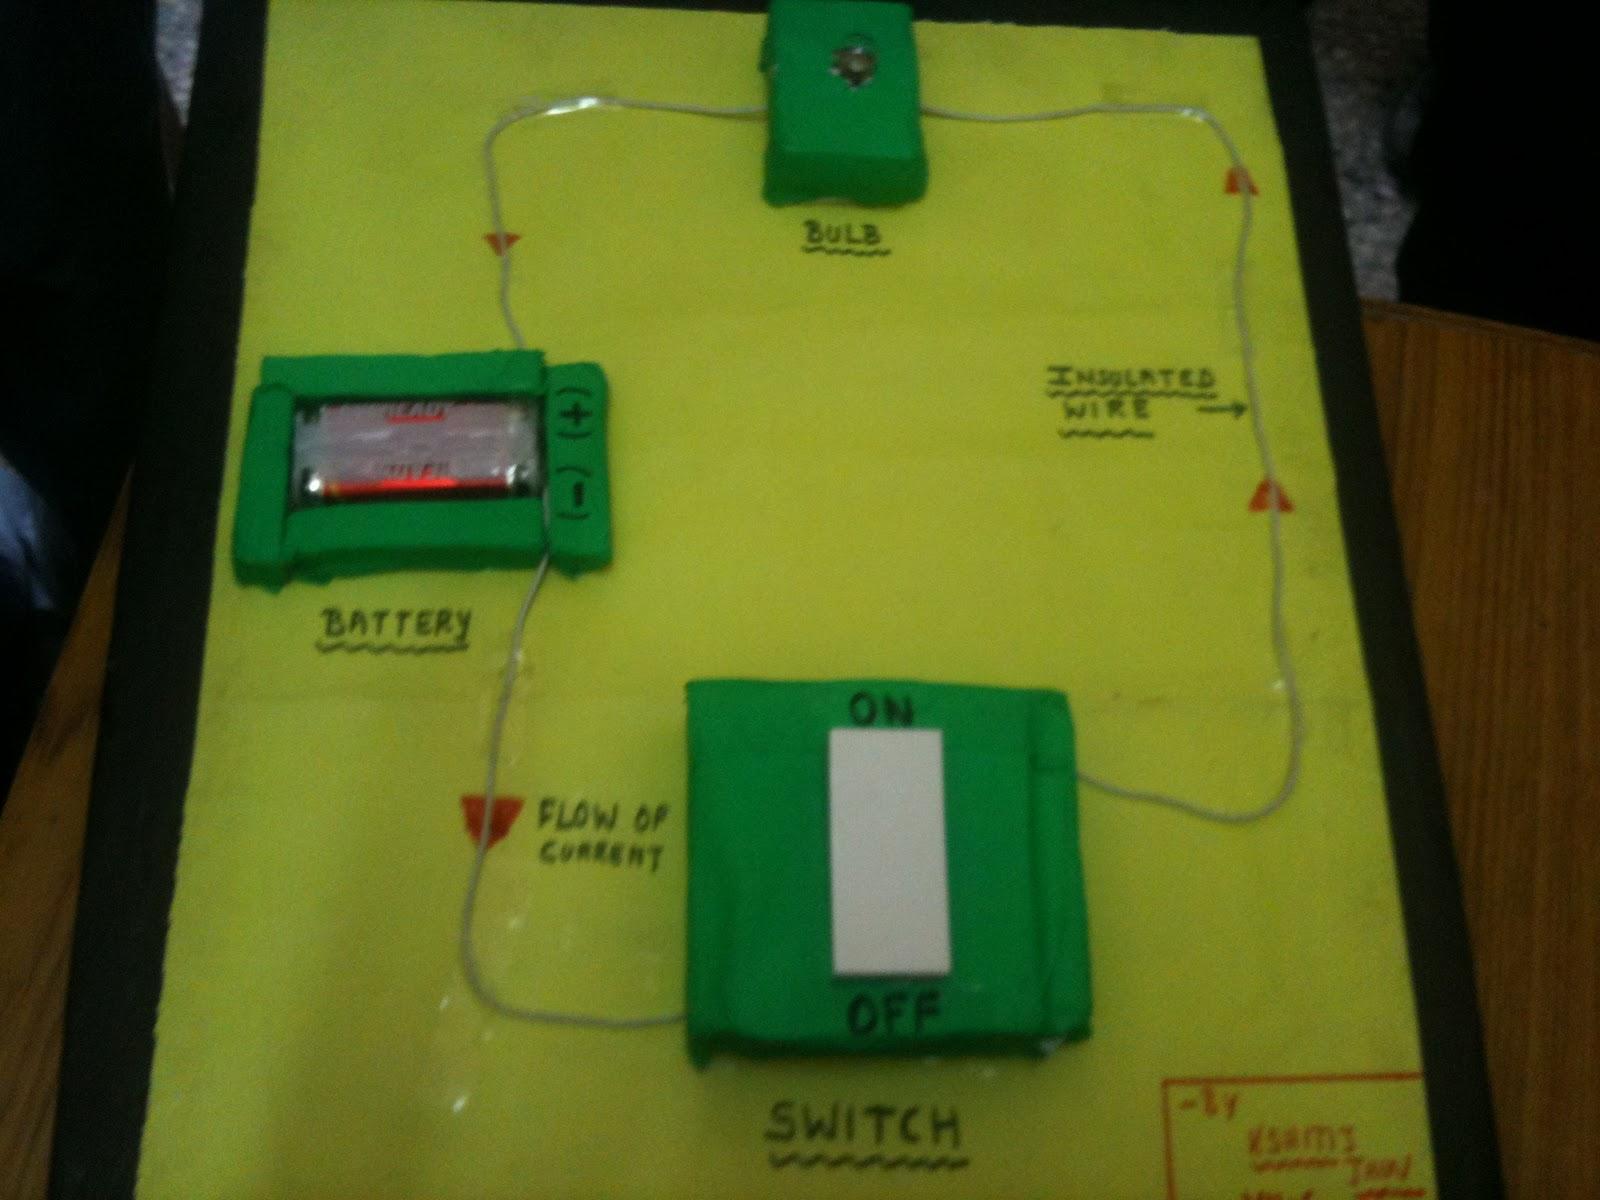 circuitlab public circuits tagged quotrelayflipflopquot routenew mx tl